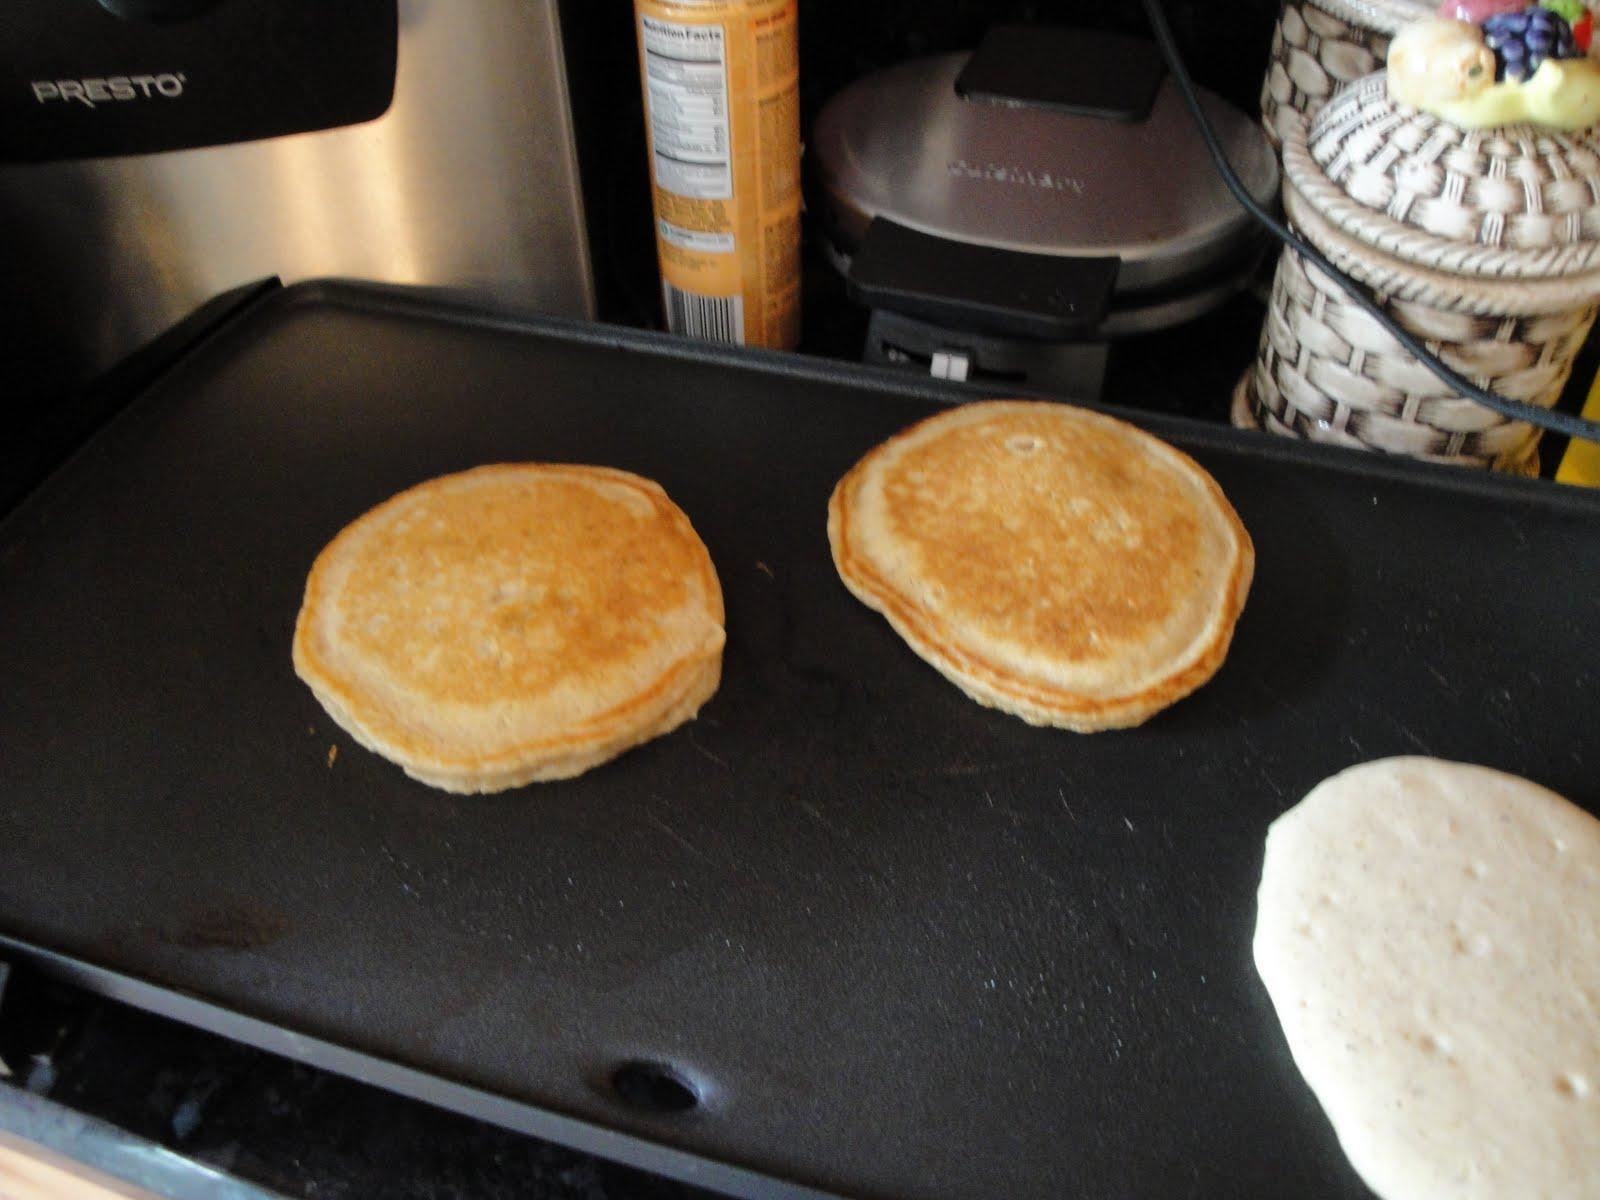 Squirrels-n-Sweets: Chai Pancakes Please!